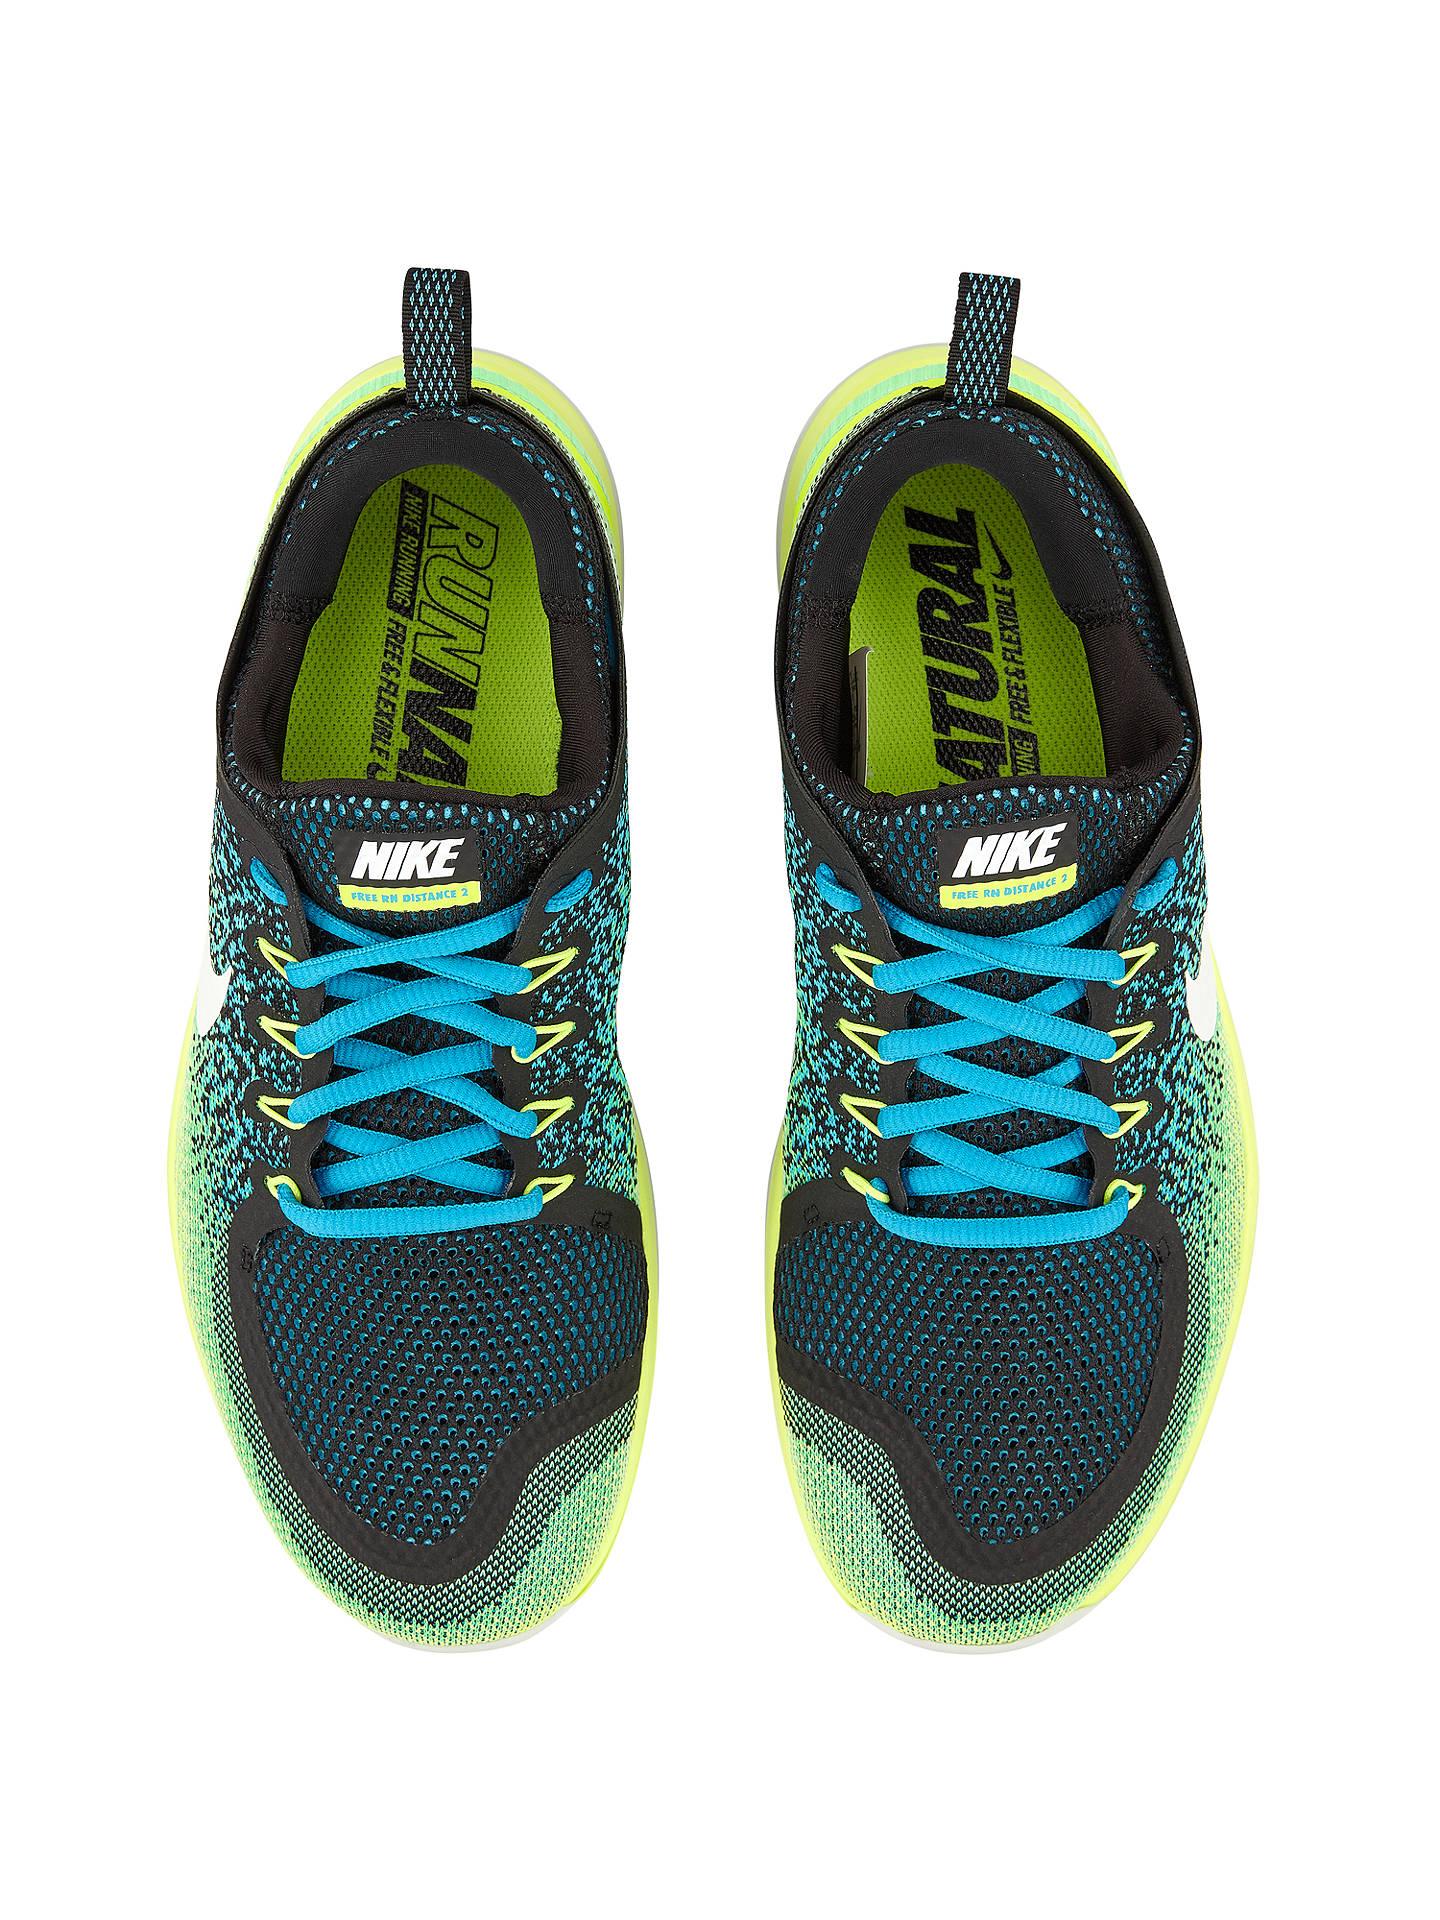 Nike Free Rn Distance 2 Men S Running Shoes Blue At John Lewis Partners